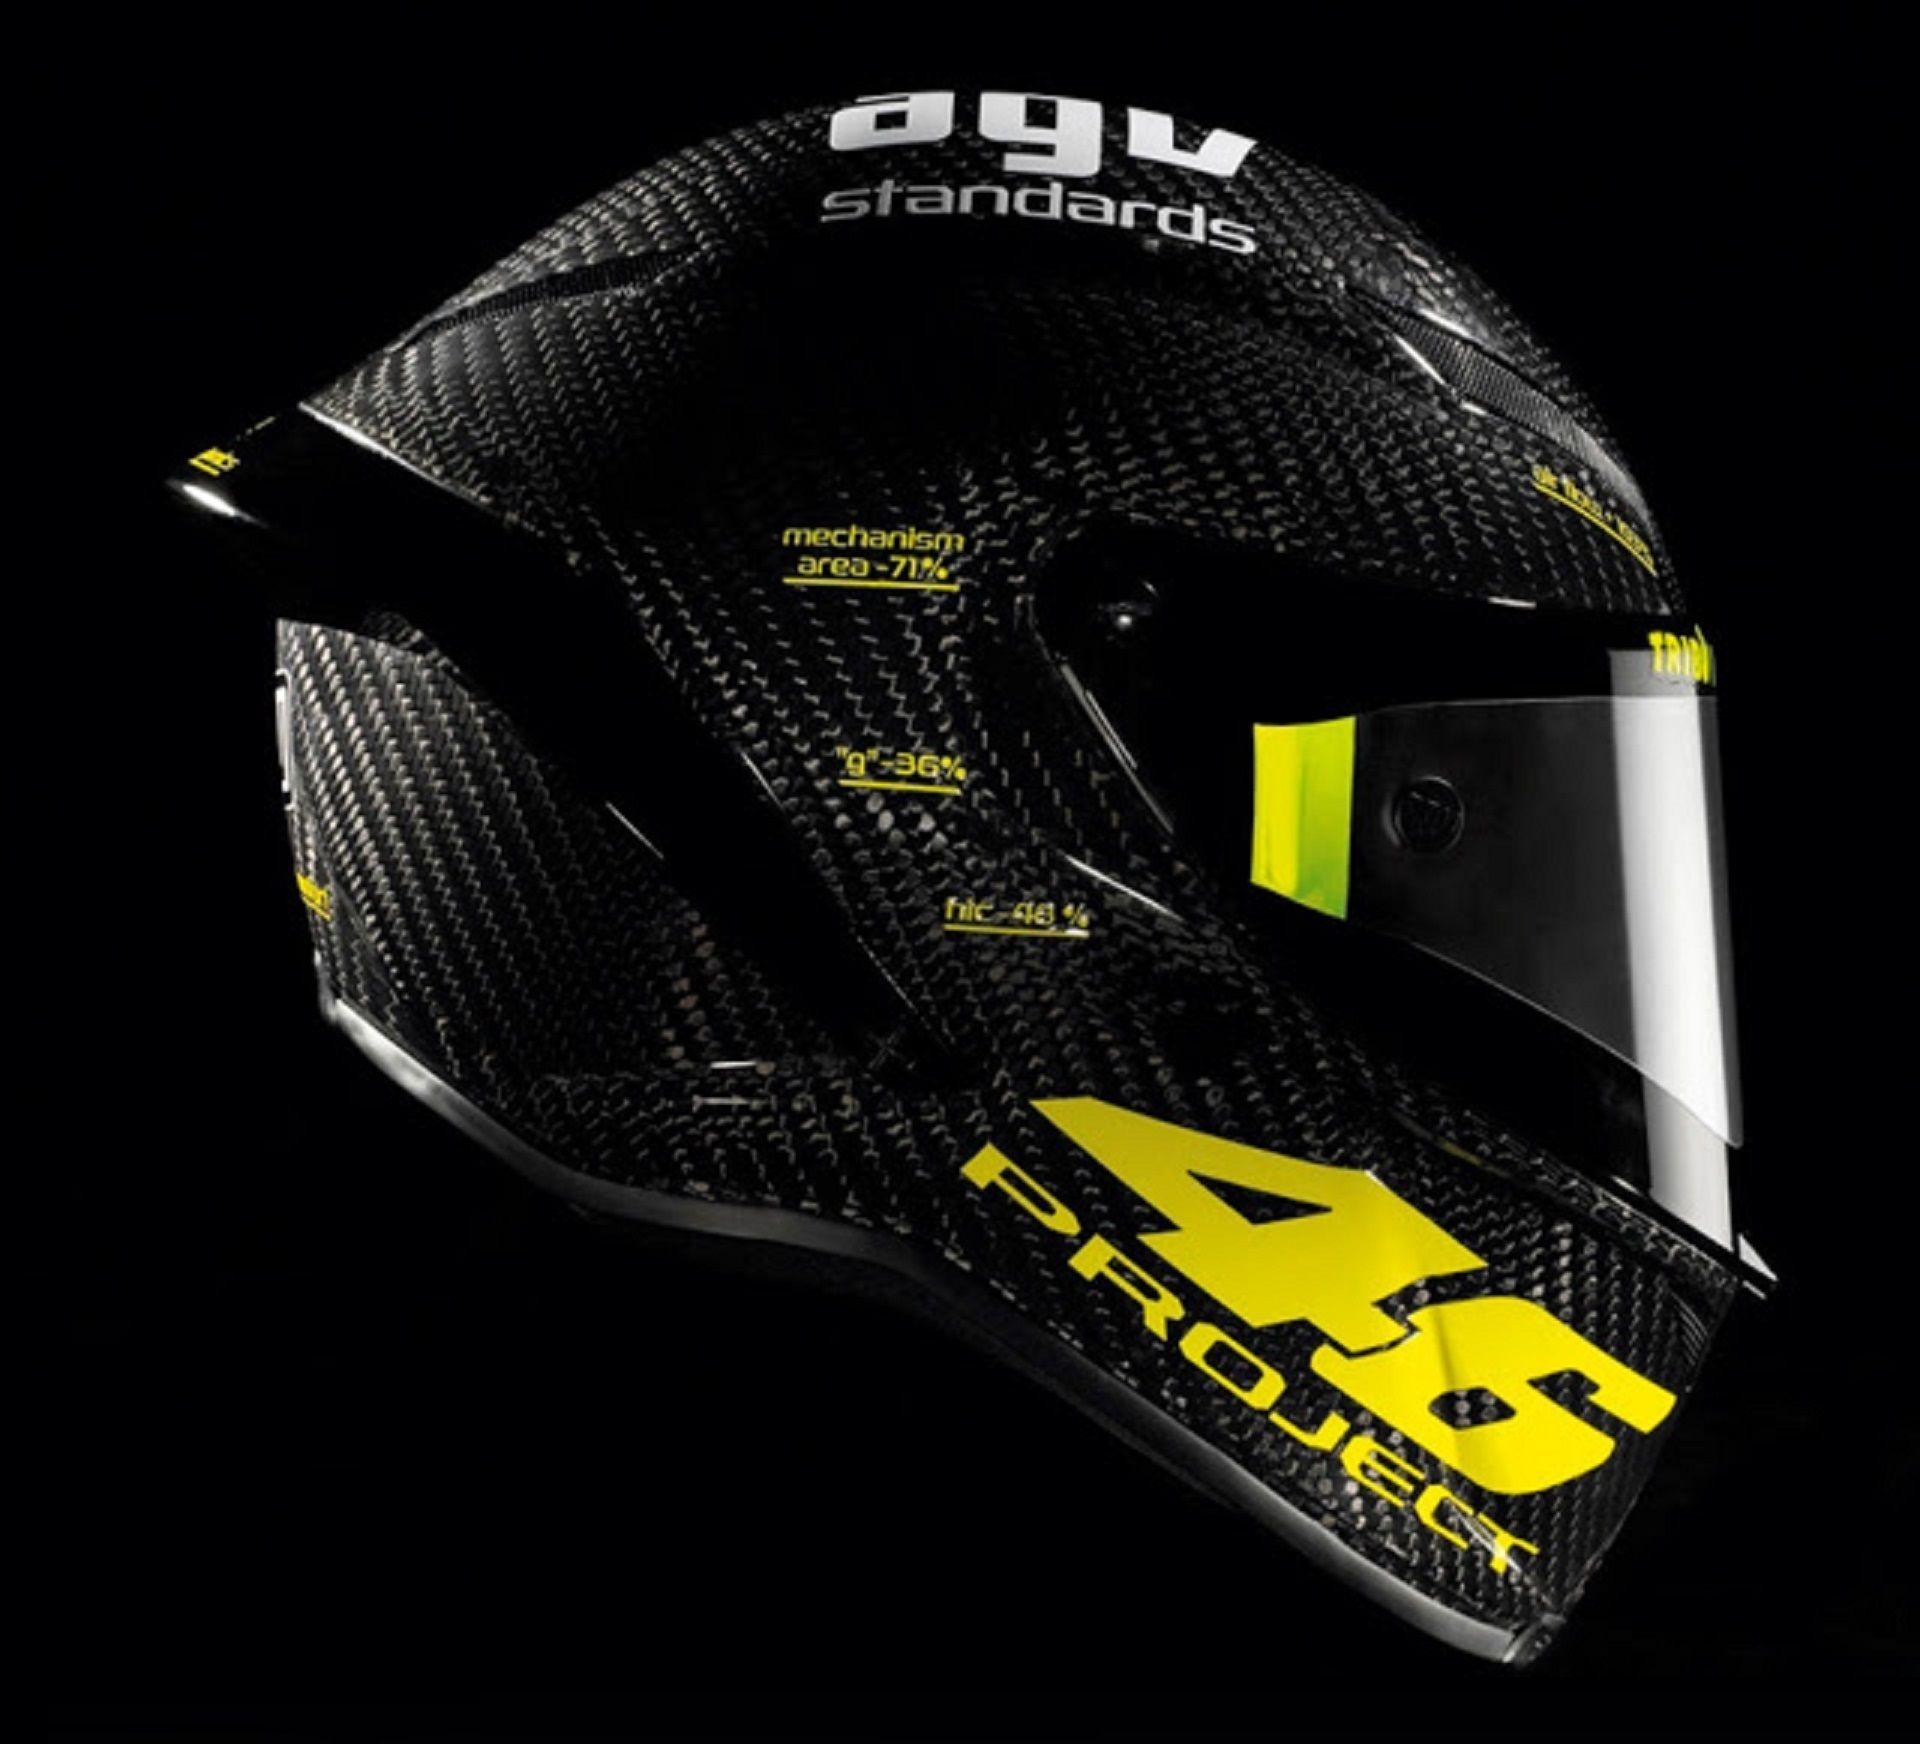 Motogp Valentino Rossi Helmet By Avg Custom Laid Carbon Fibre Http Mercenary Ie 2 Valentino Rossi Helmet Motogp Valentino Rossi Cool Motorcycle Helmets